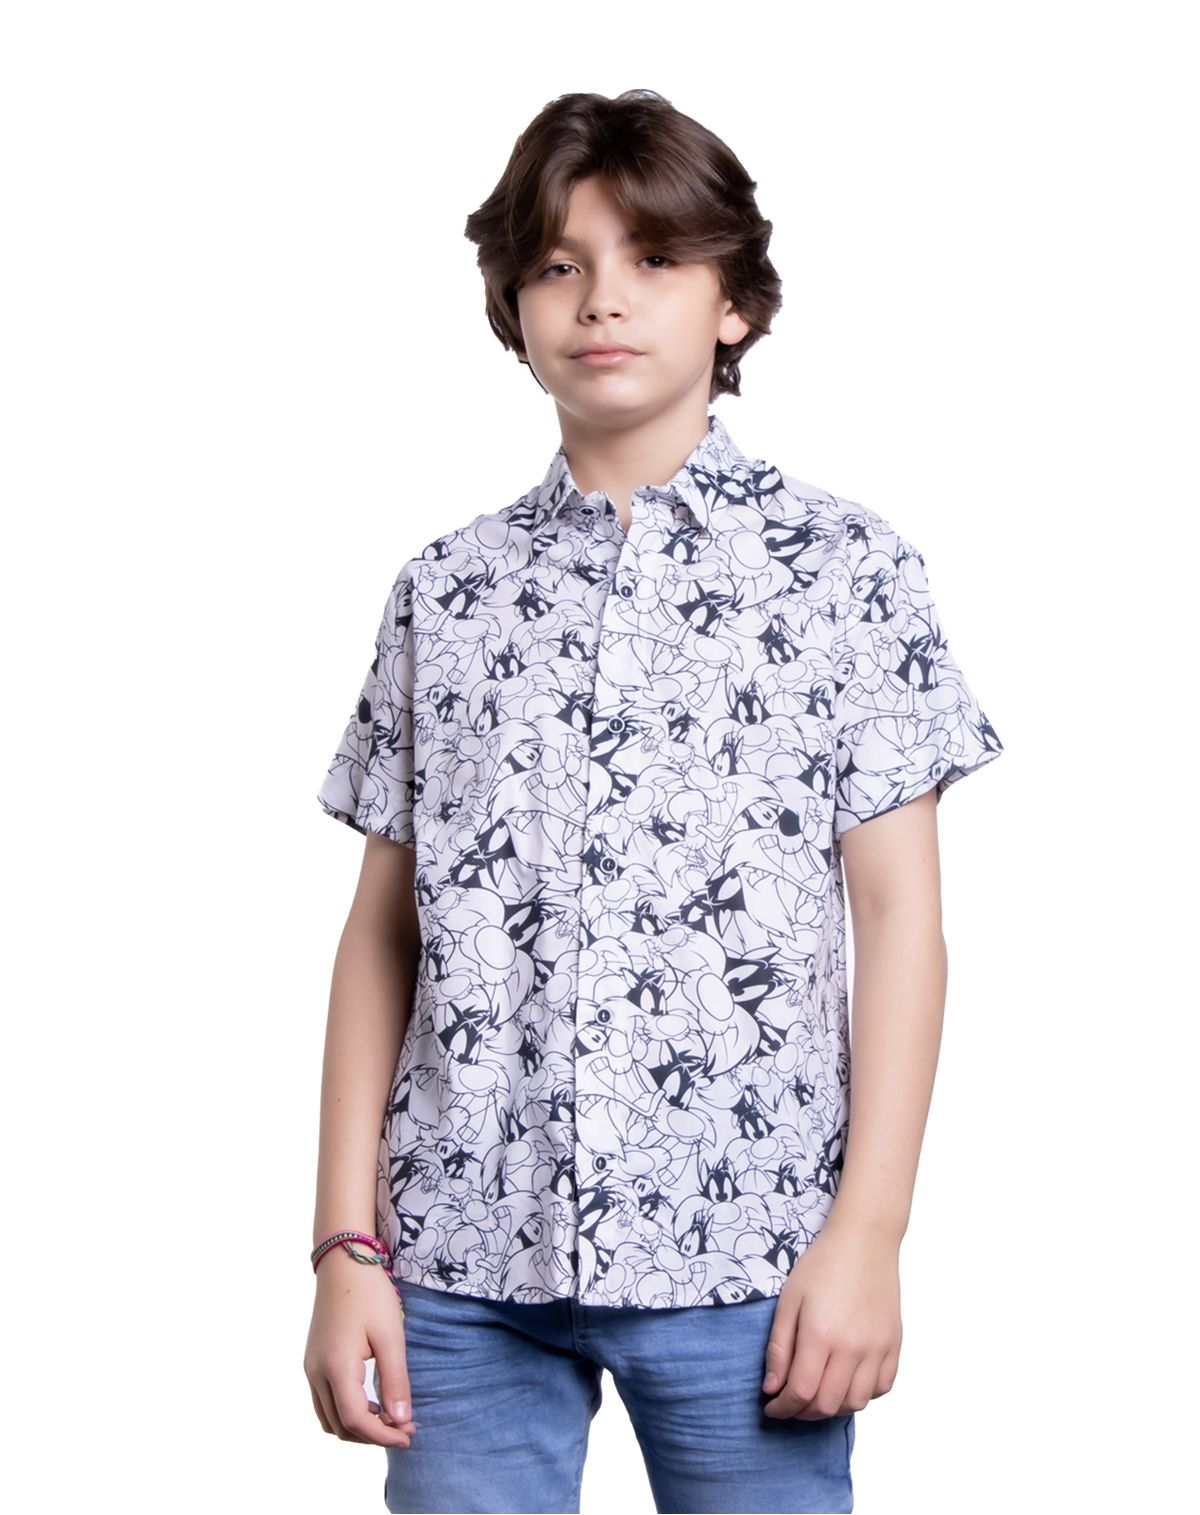 580442002-camisa-manga-curta-juvenil-menino-estampa-patolino-branco-12-692